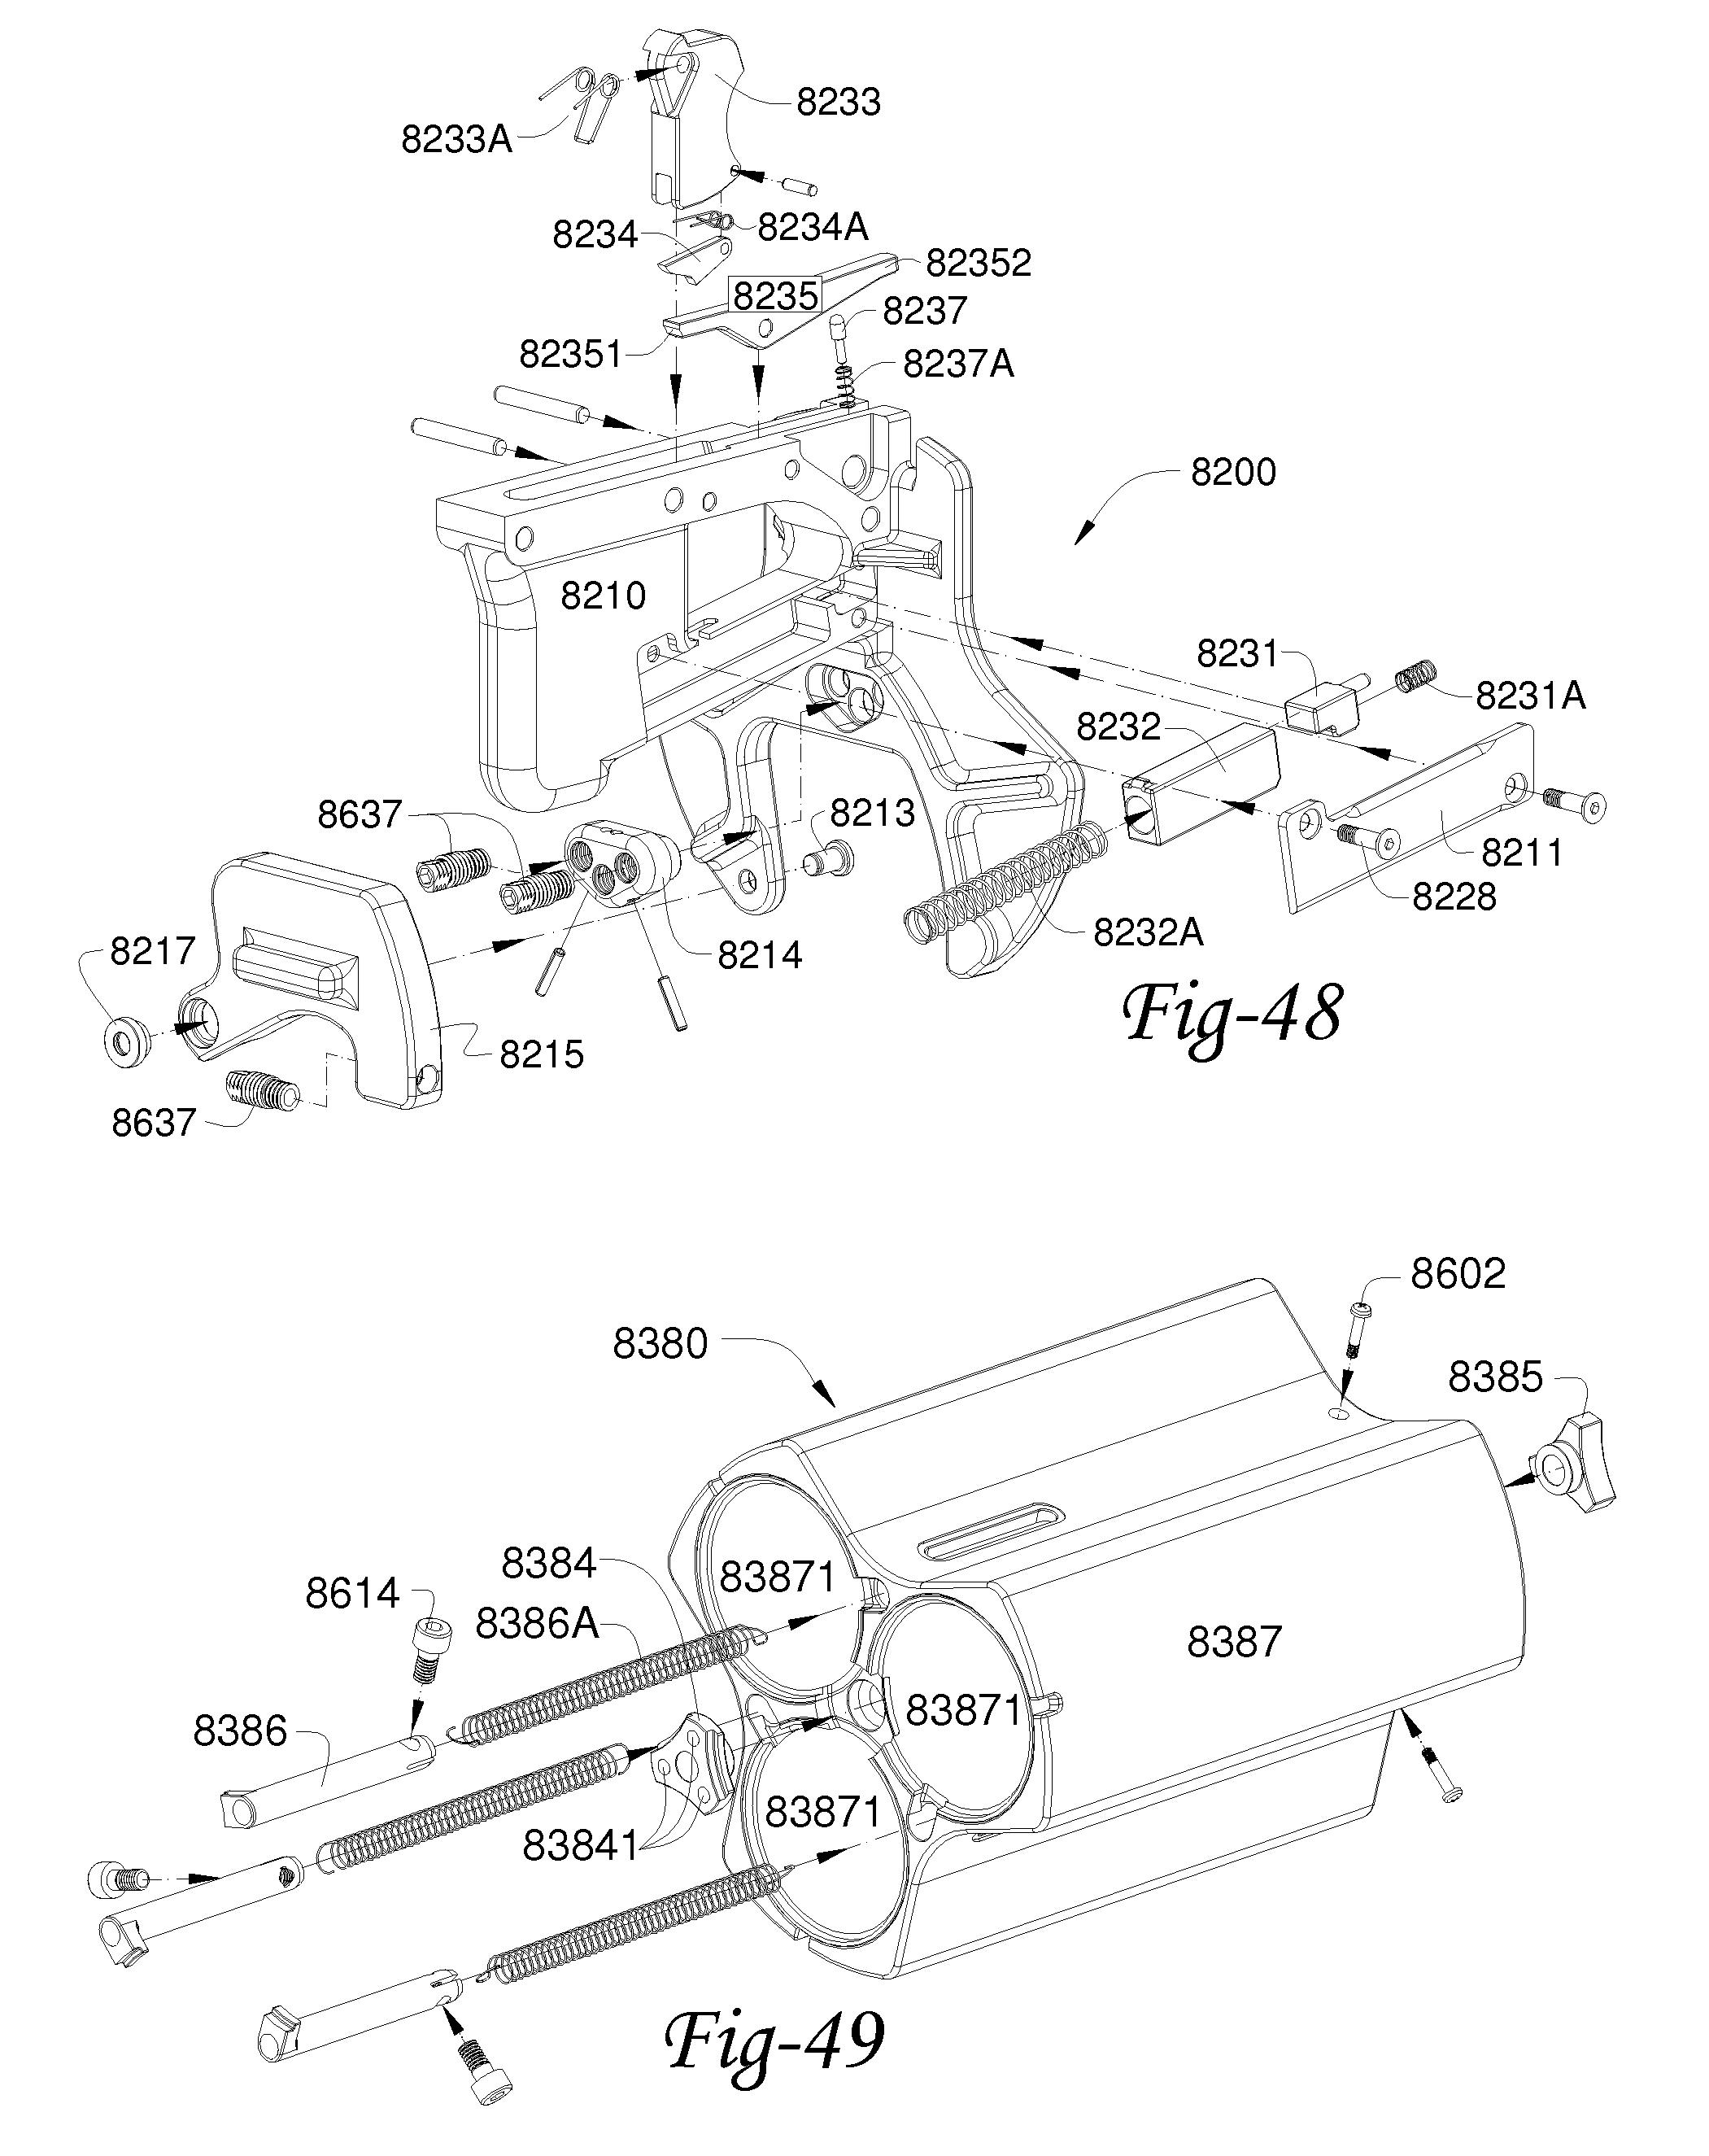 Remington 1100 trigger diagram free download wiring diagrams